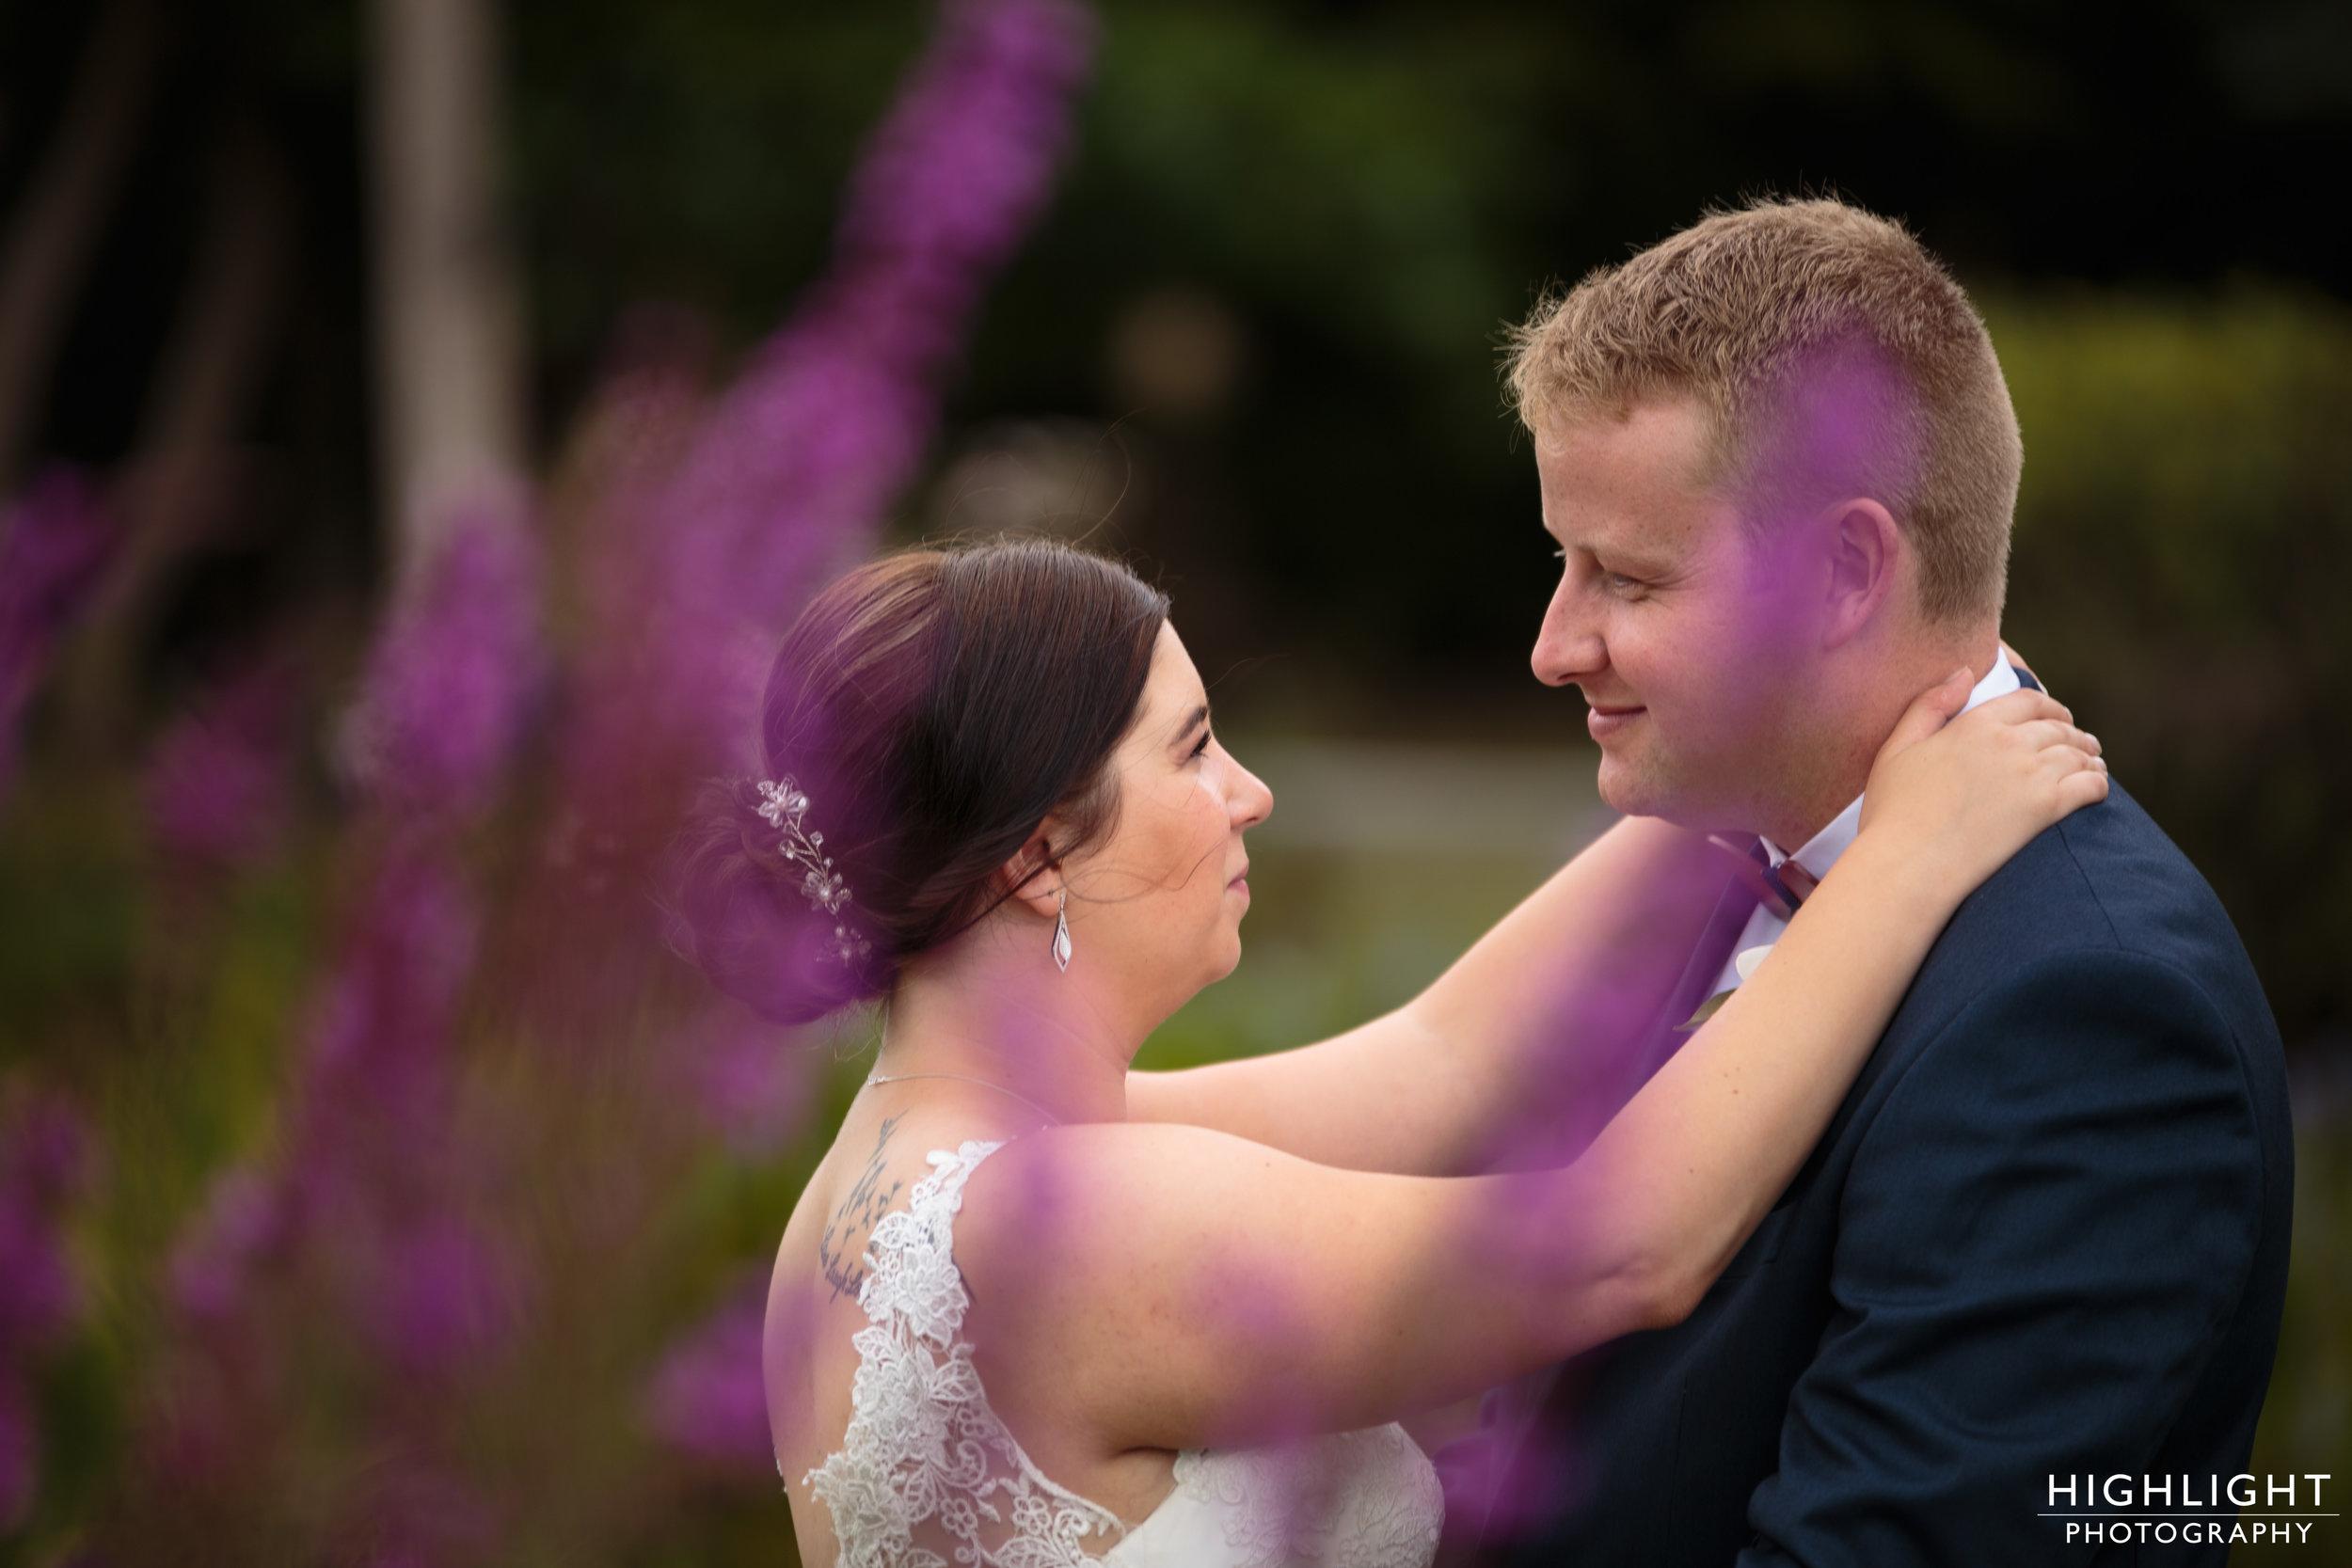 JM-2017-Highlight-wedding-photography-palmerston-north-new-zealand-130.jpg